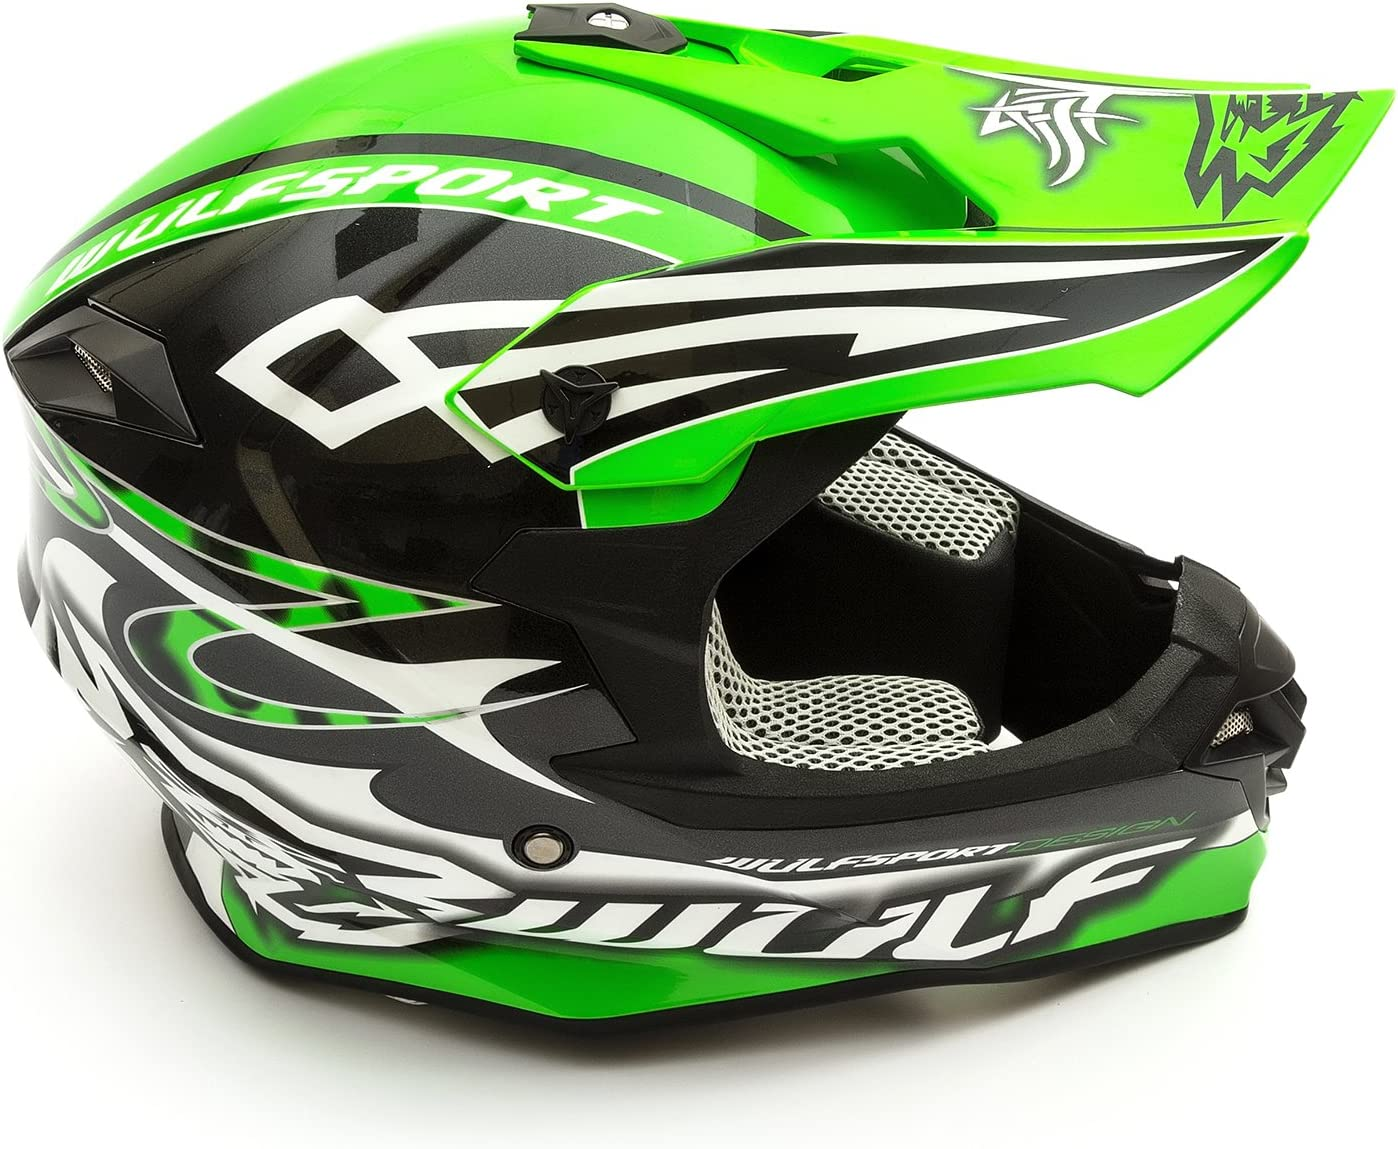 Wulfsport Adult Sceptre Helmet Large White Motocross Pitbike Motorbike Off Road Racing ATV Enduro Helmet